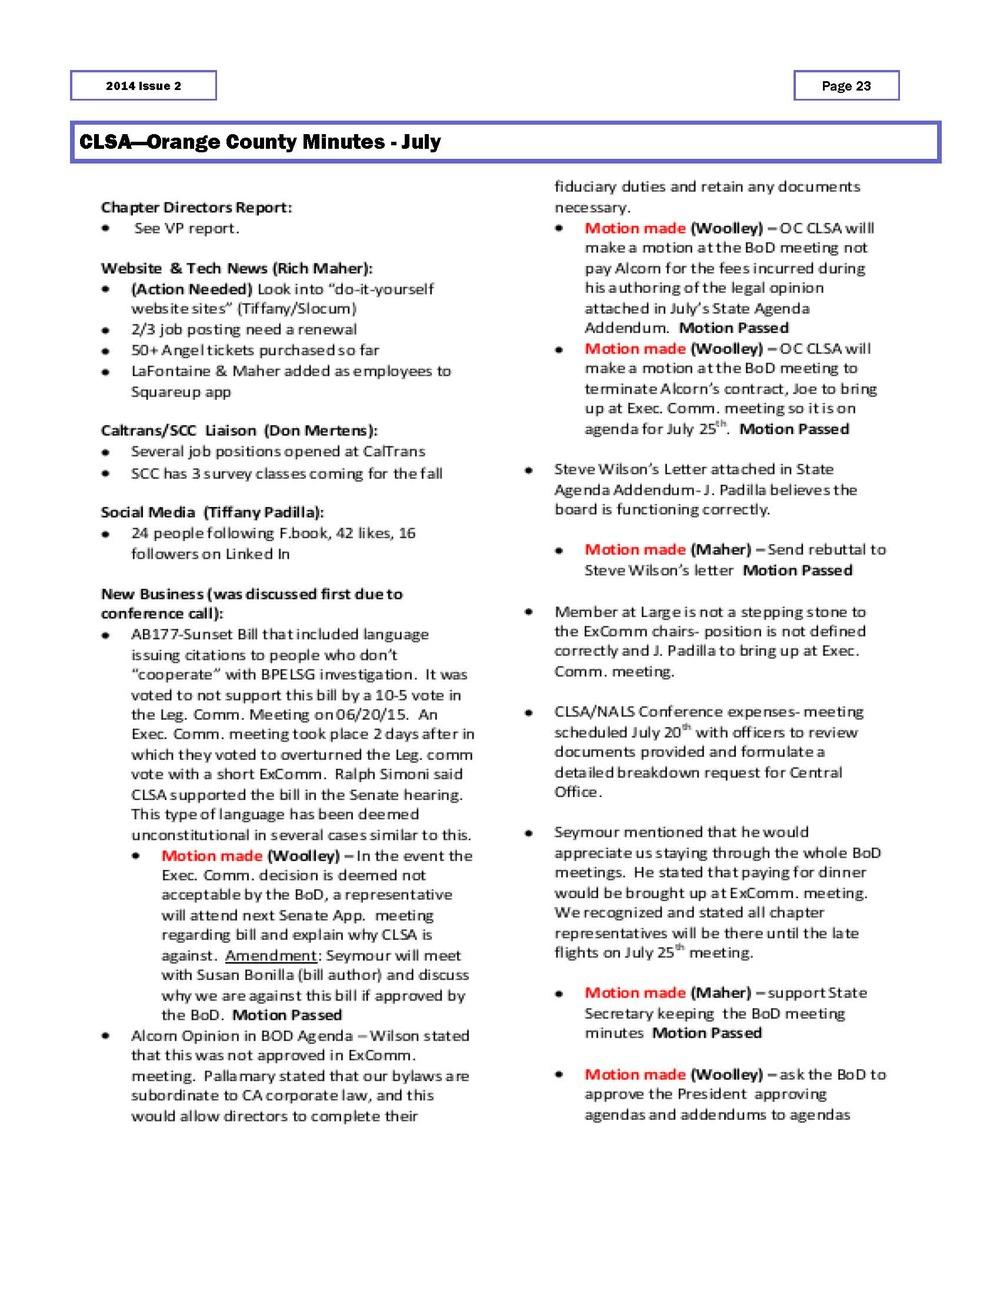 OC-CLSA 082015 Newsletter_Page_29.jpg